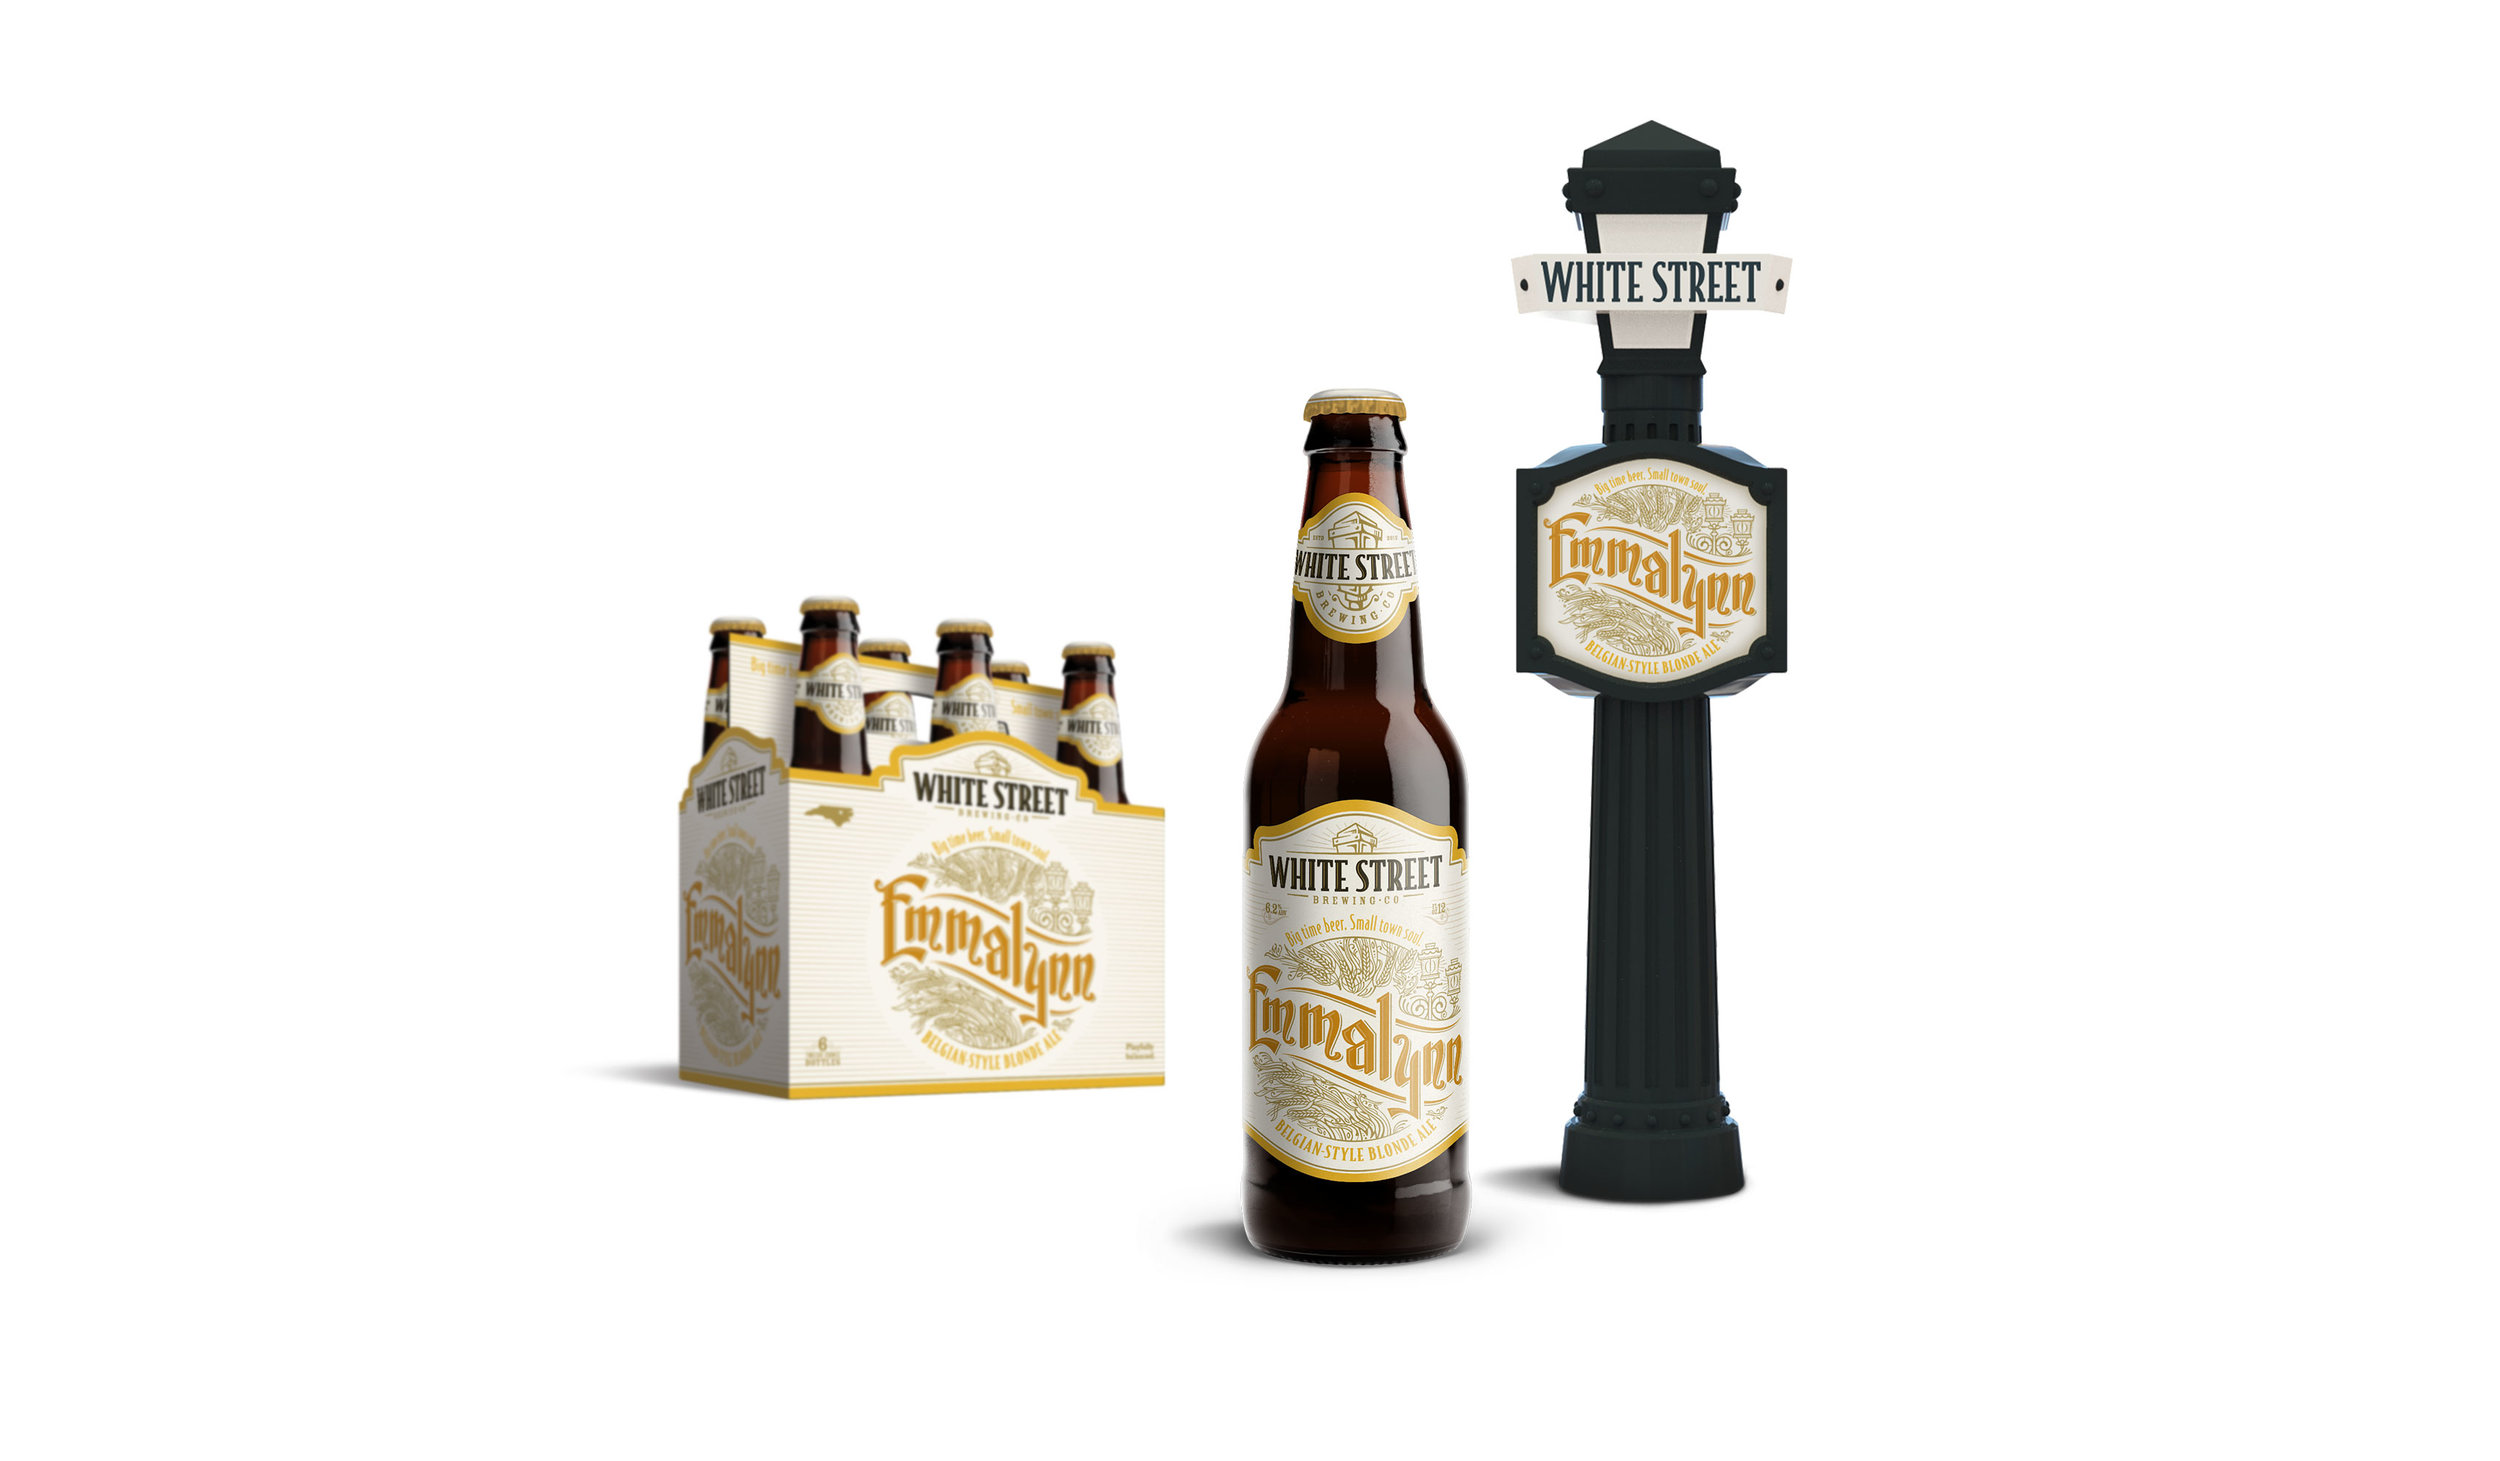 Craft-Beer-Branding-White-Street-Brewing-Co-Emmalynn-Product-Design.jpg